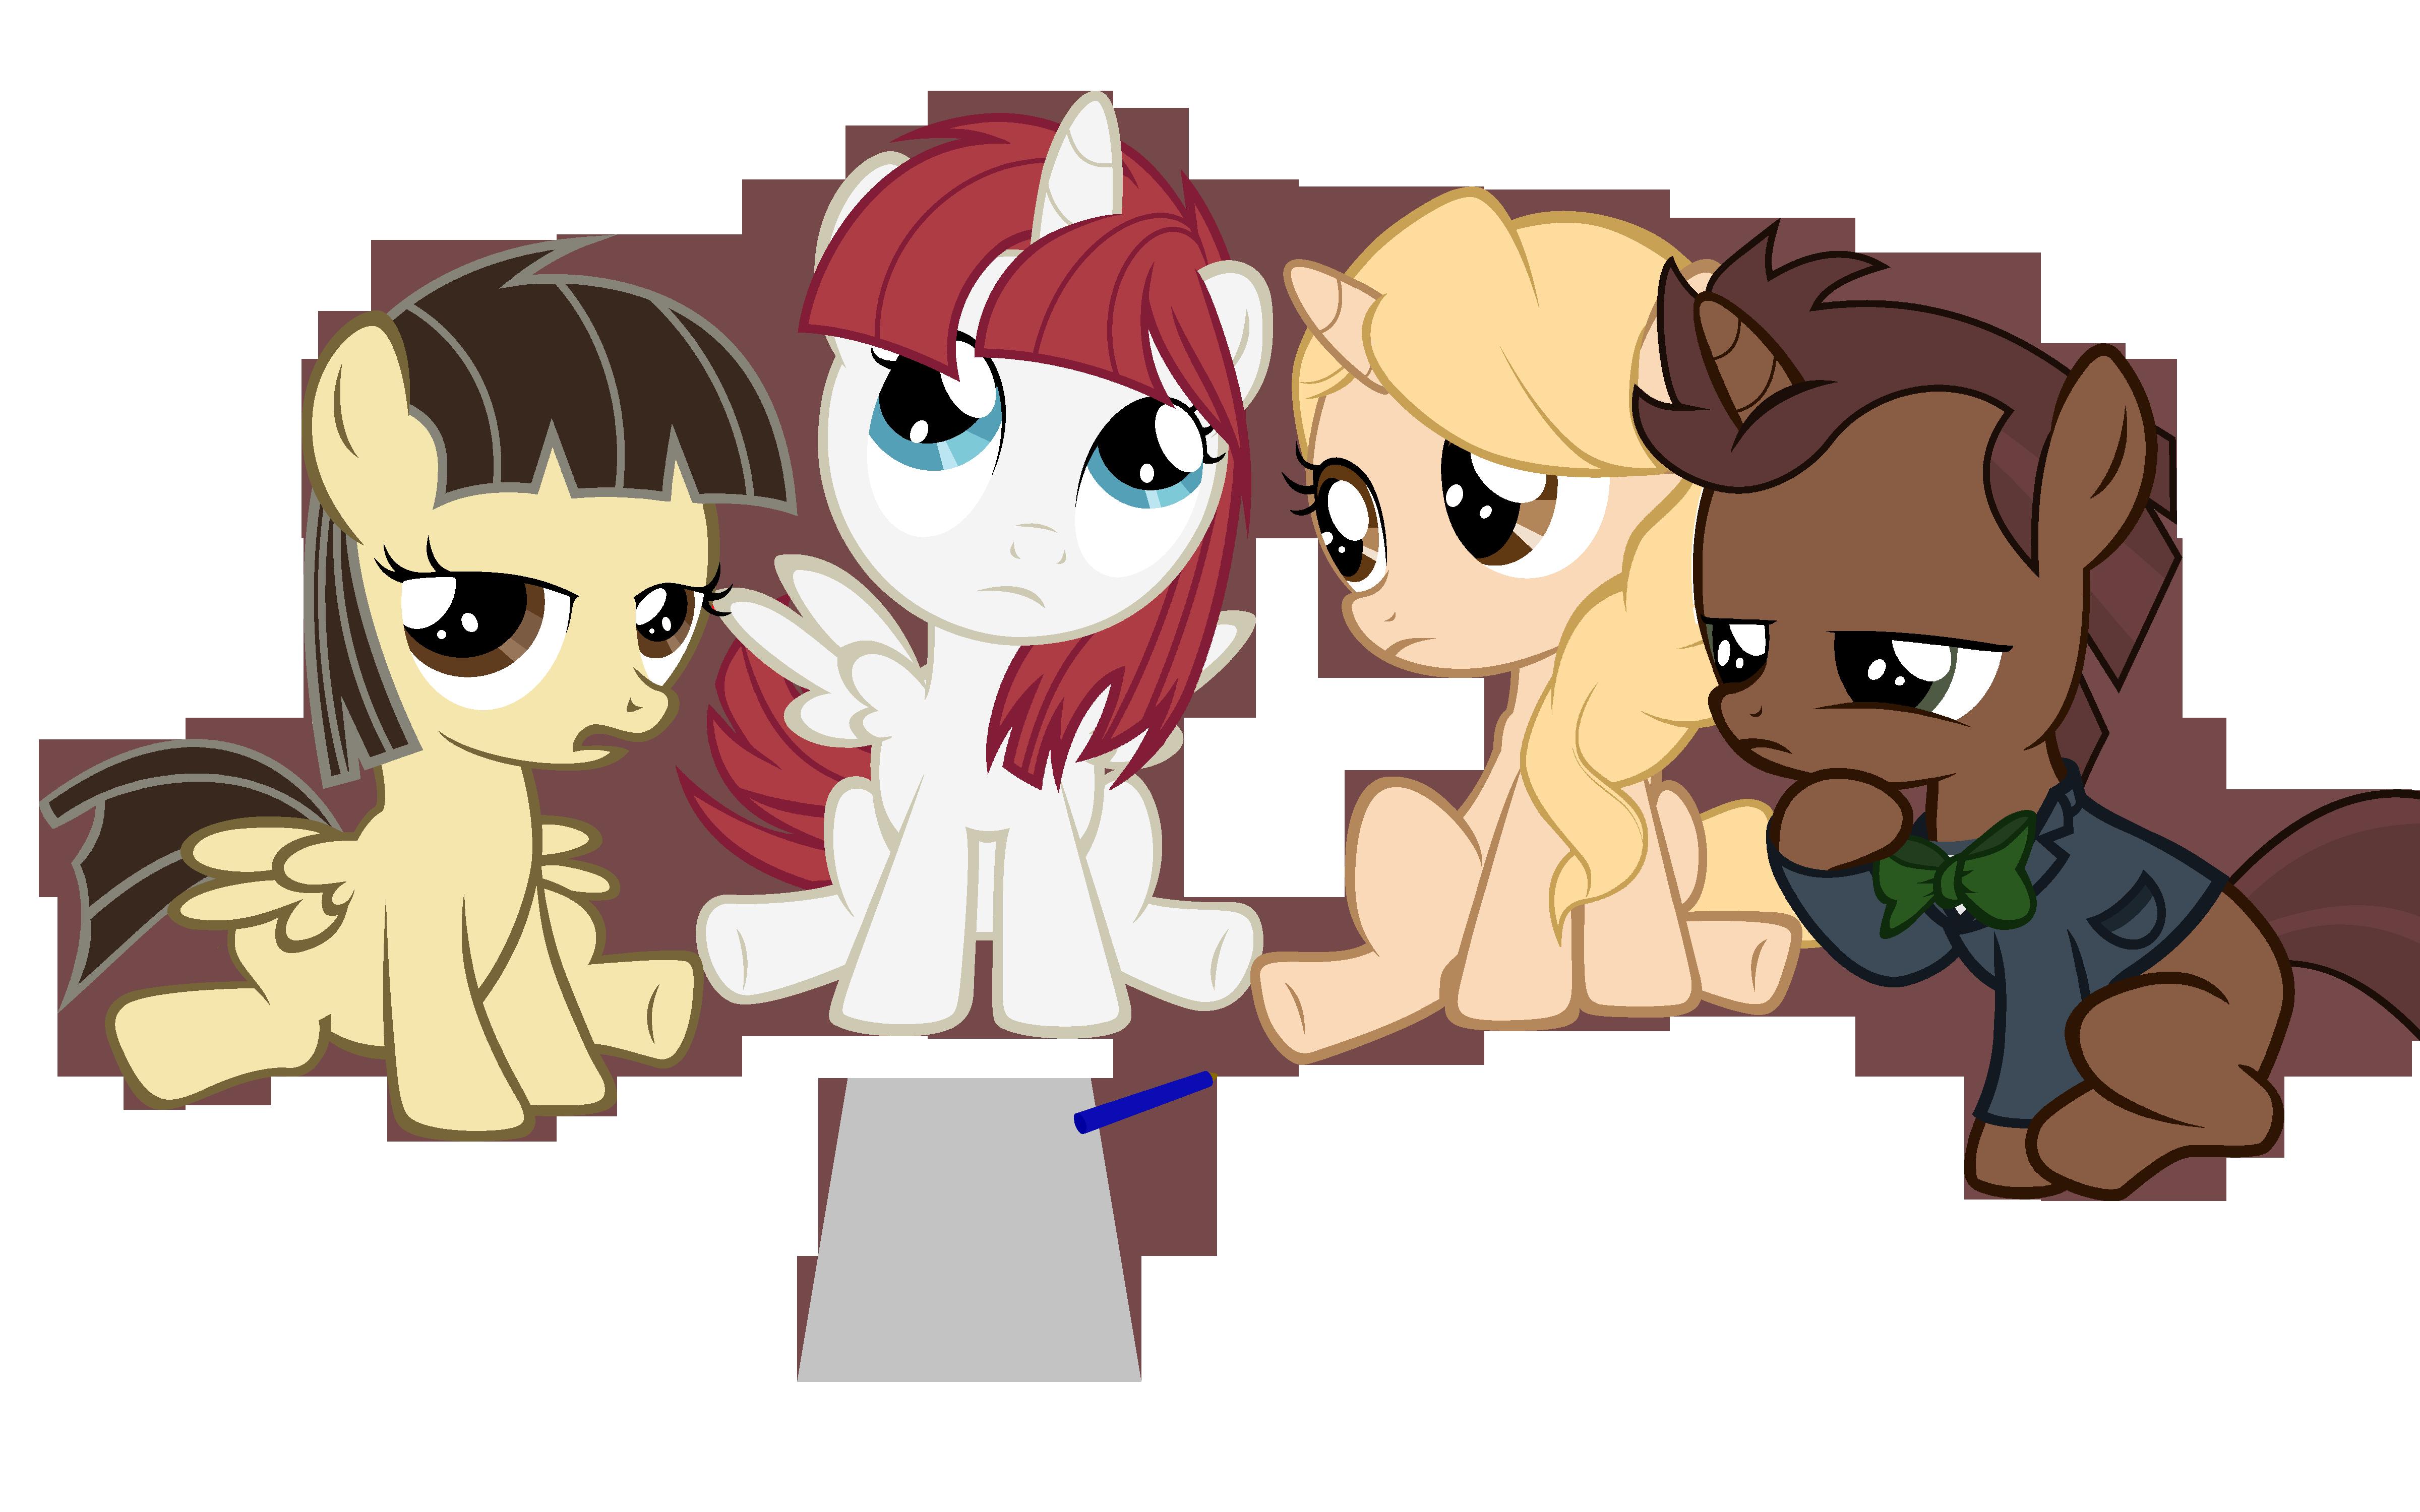 How Do We My Little Pony? by Beavernator